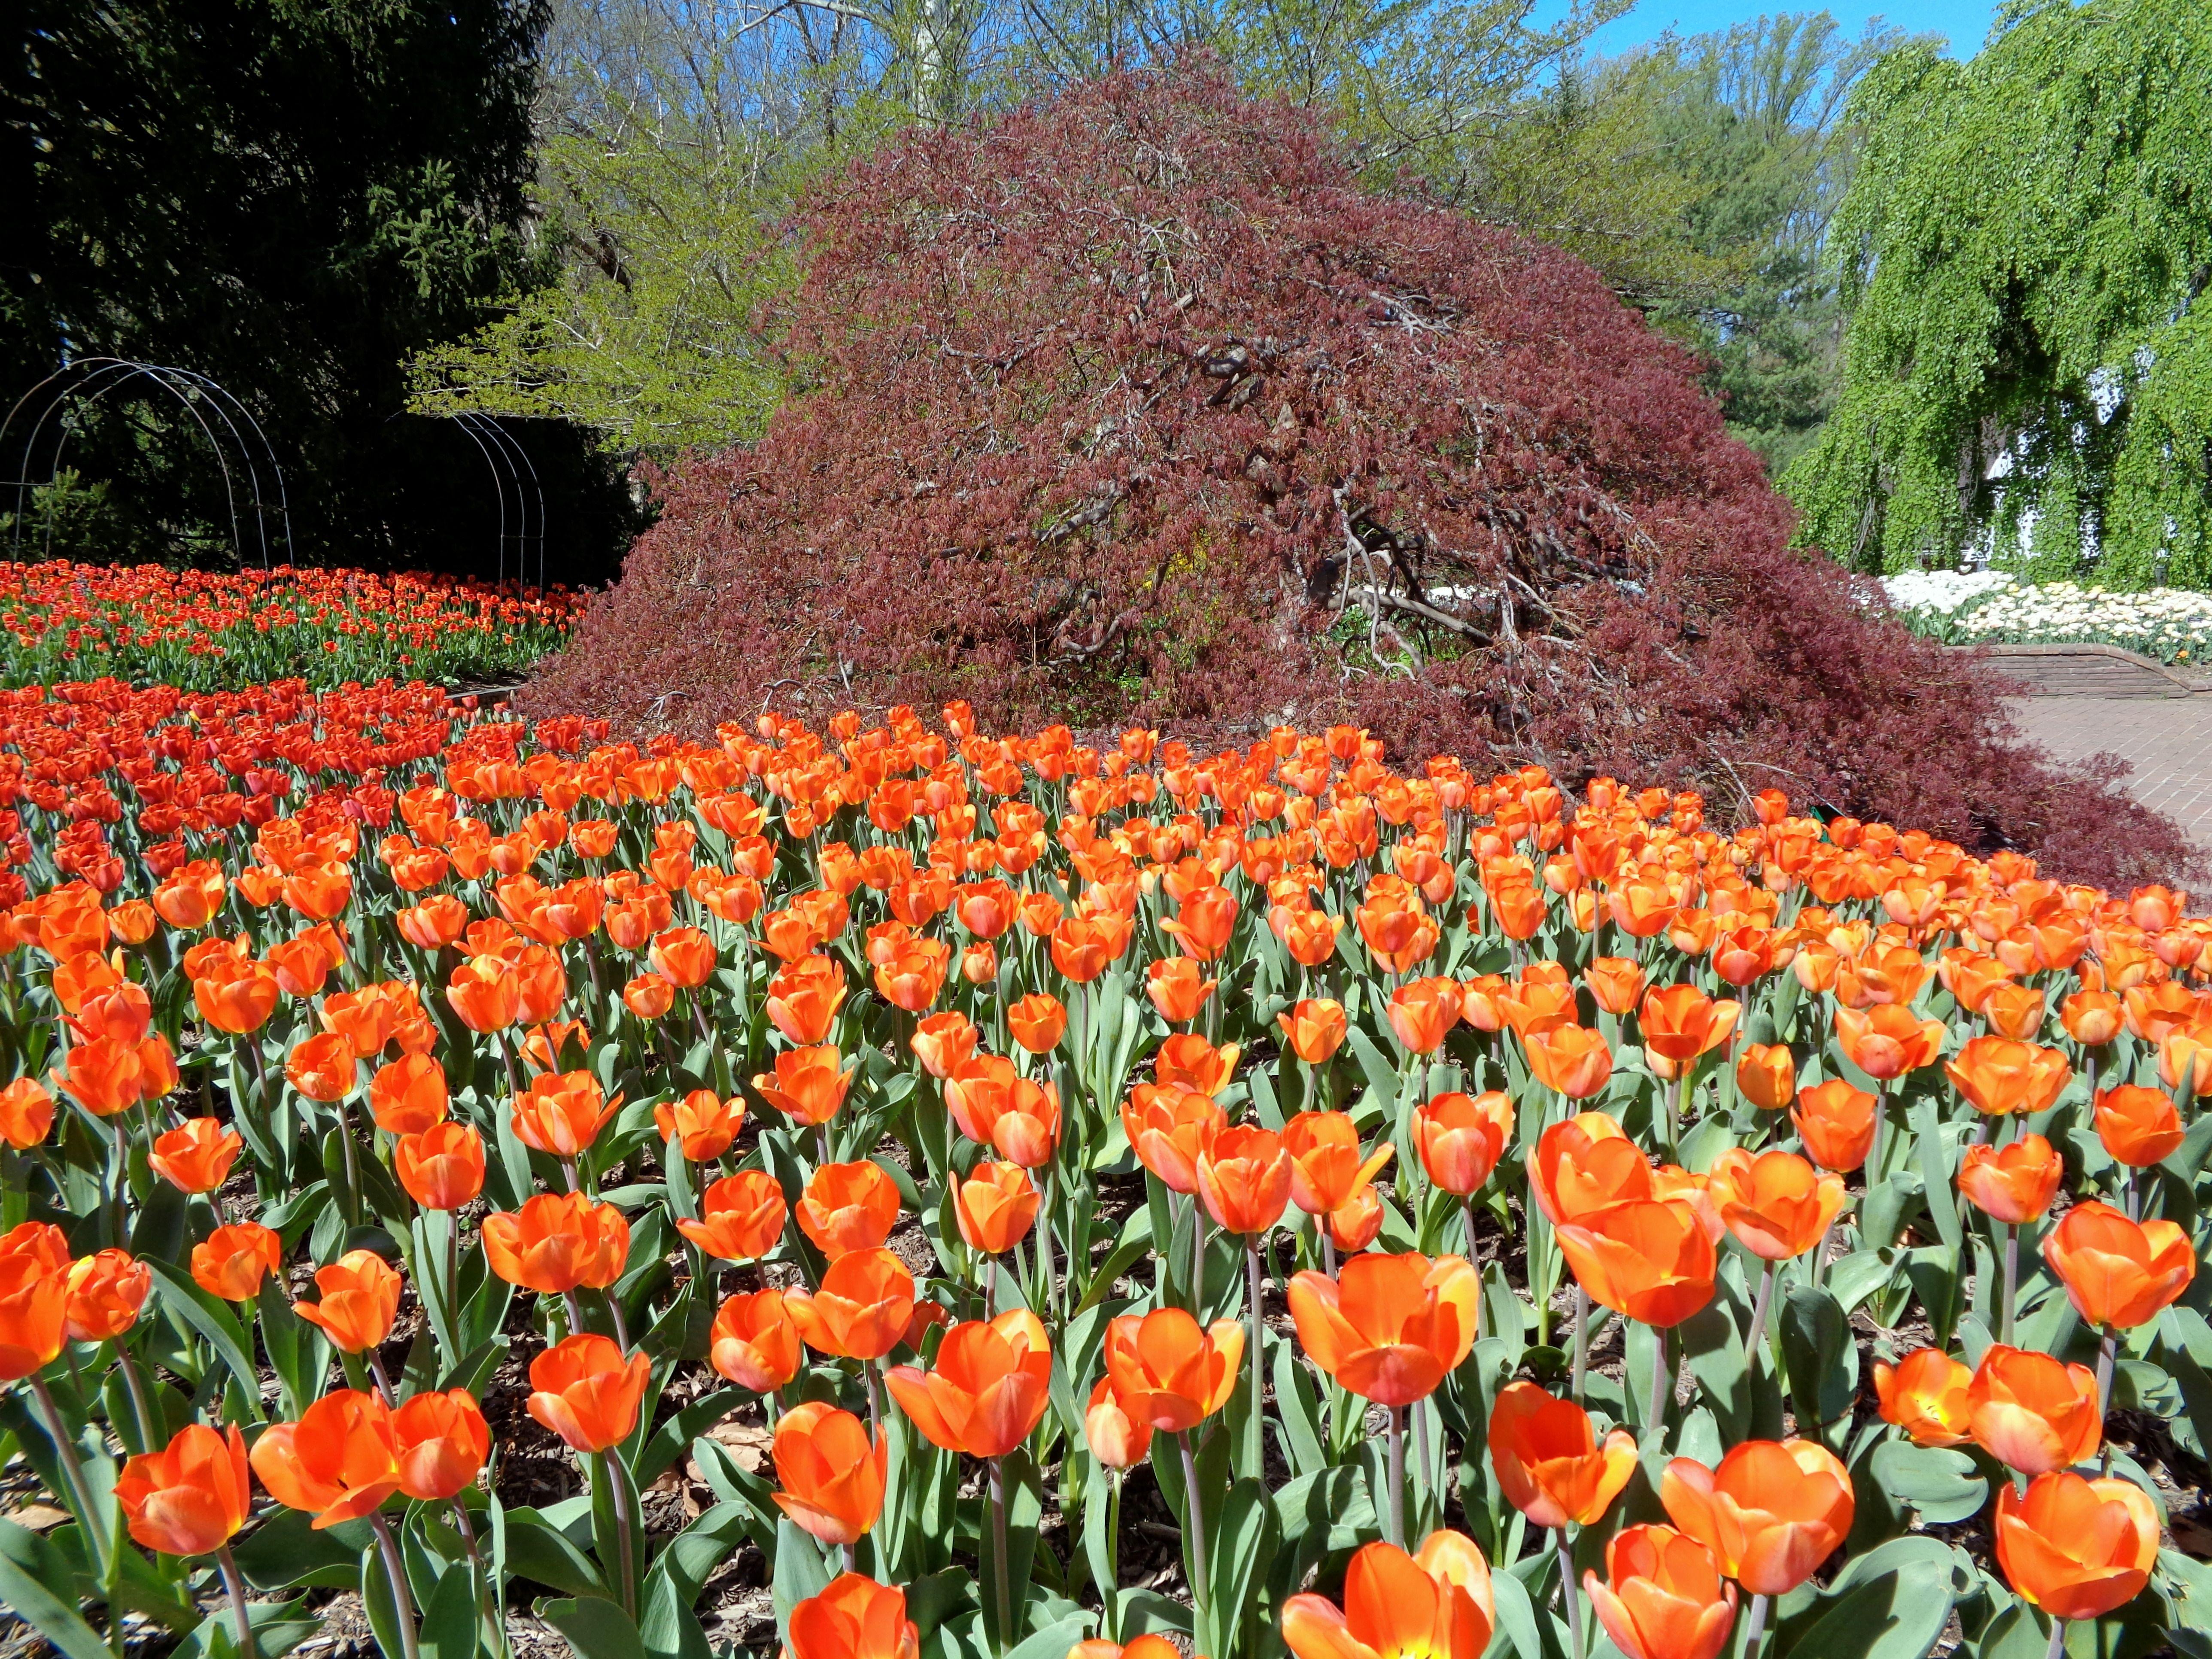 261b5008f848dee0c8713622a6561805 - Brookside Gardens Conservatory Wheaton Md 20902